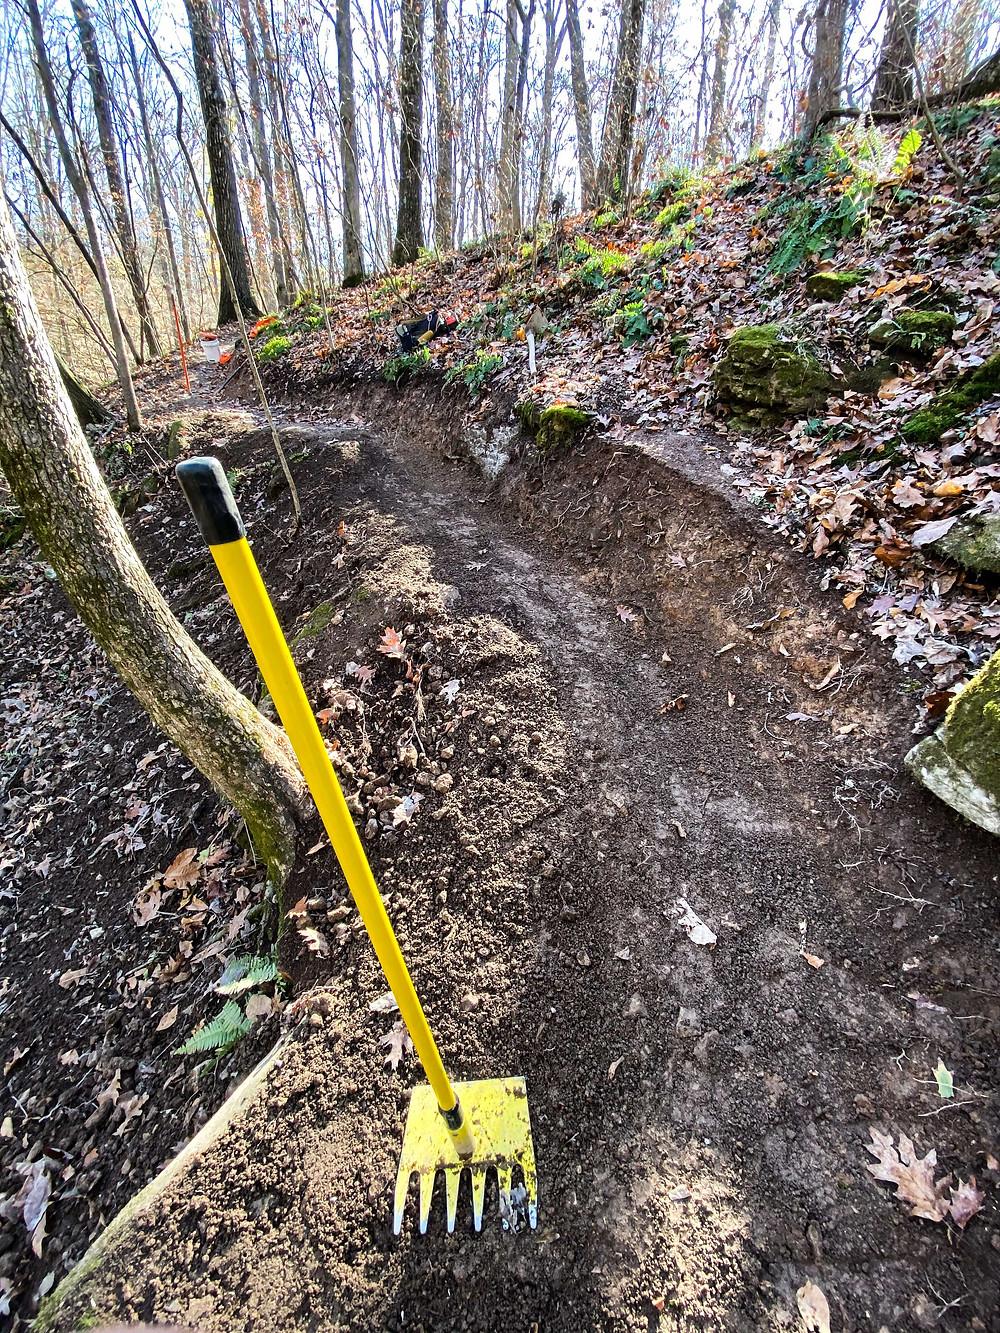 mcleod trailbuilding tool resting on freshly cut trail